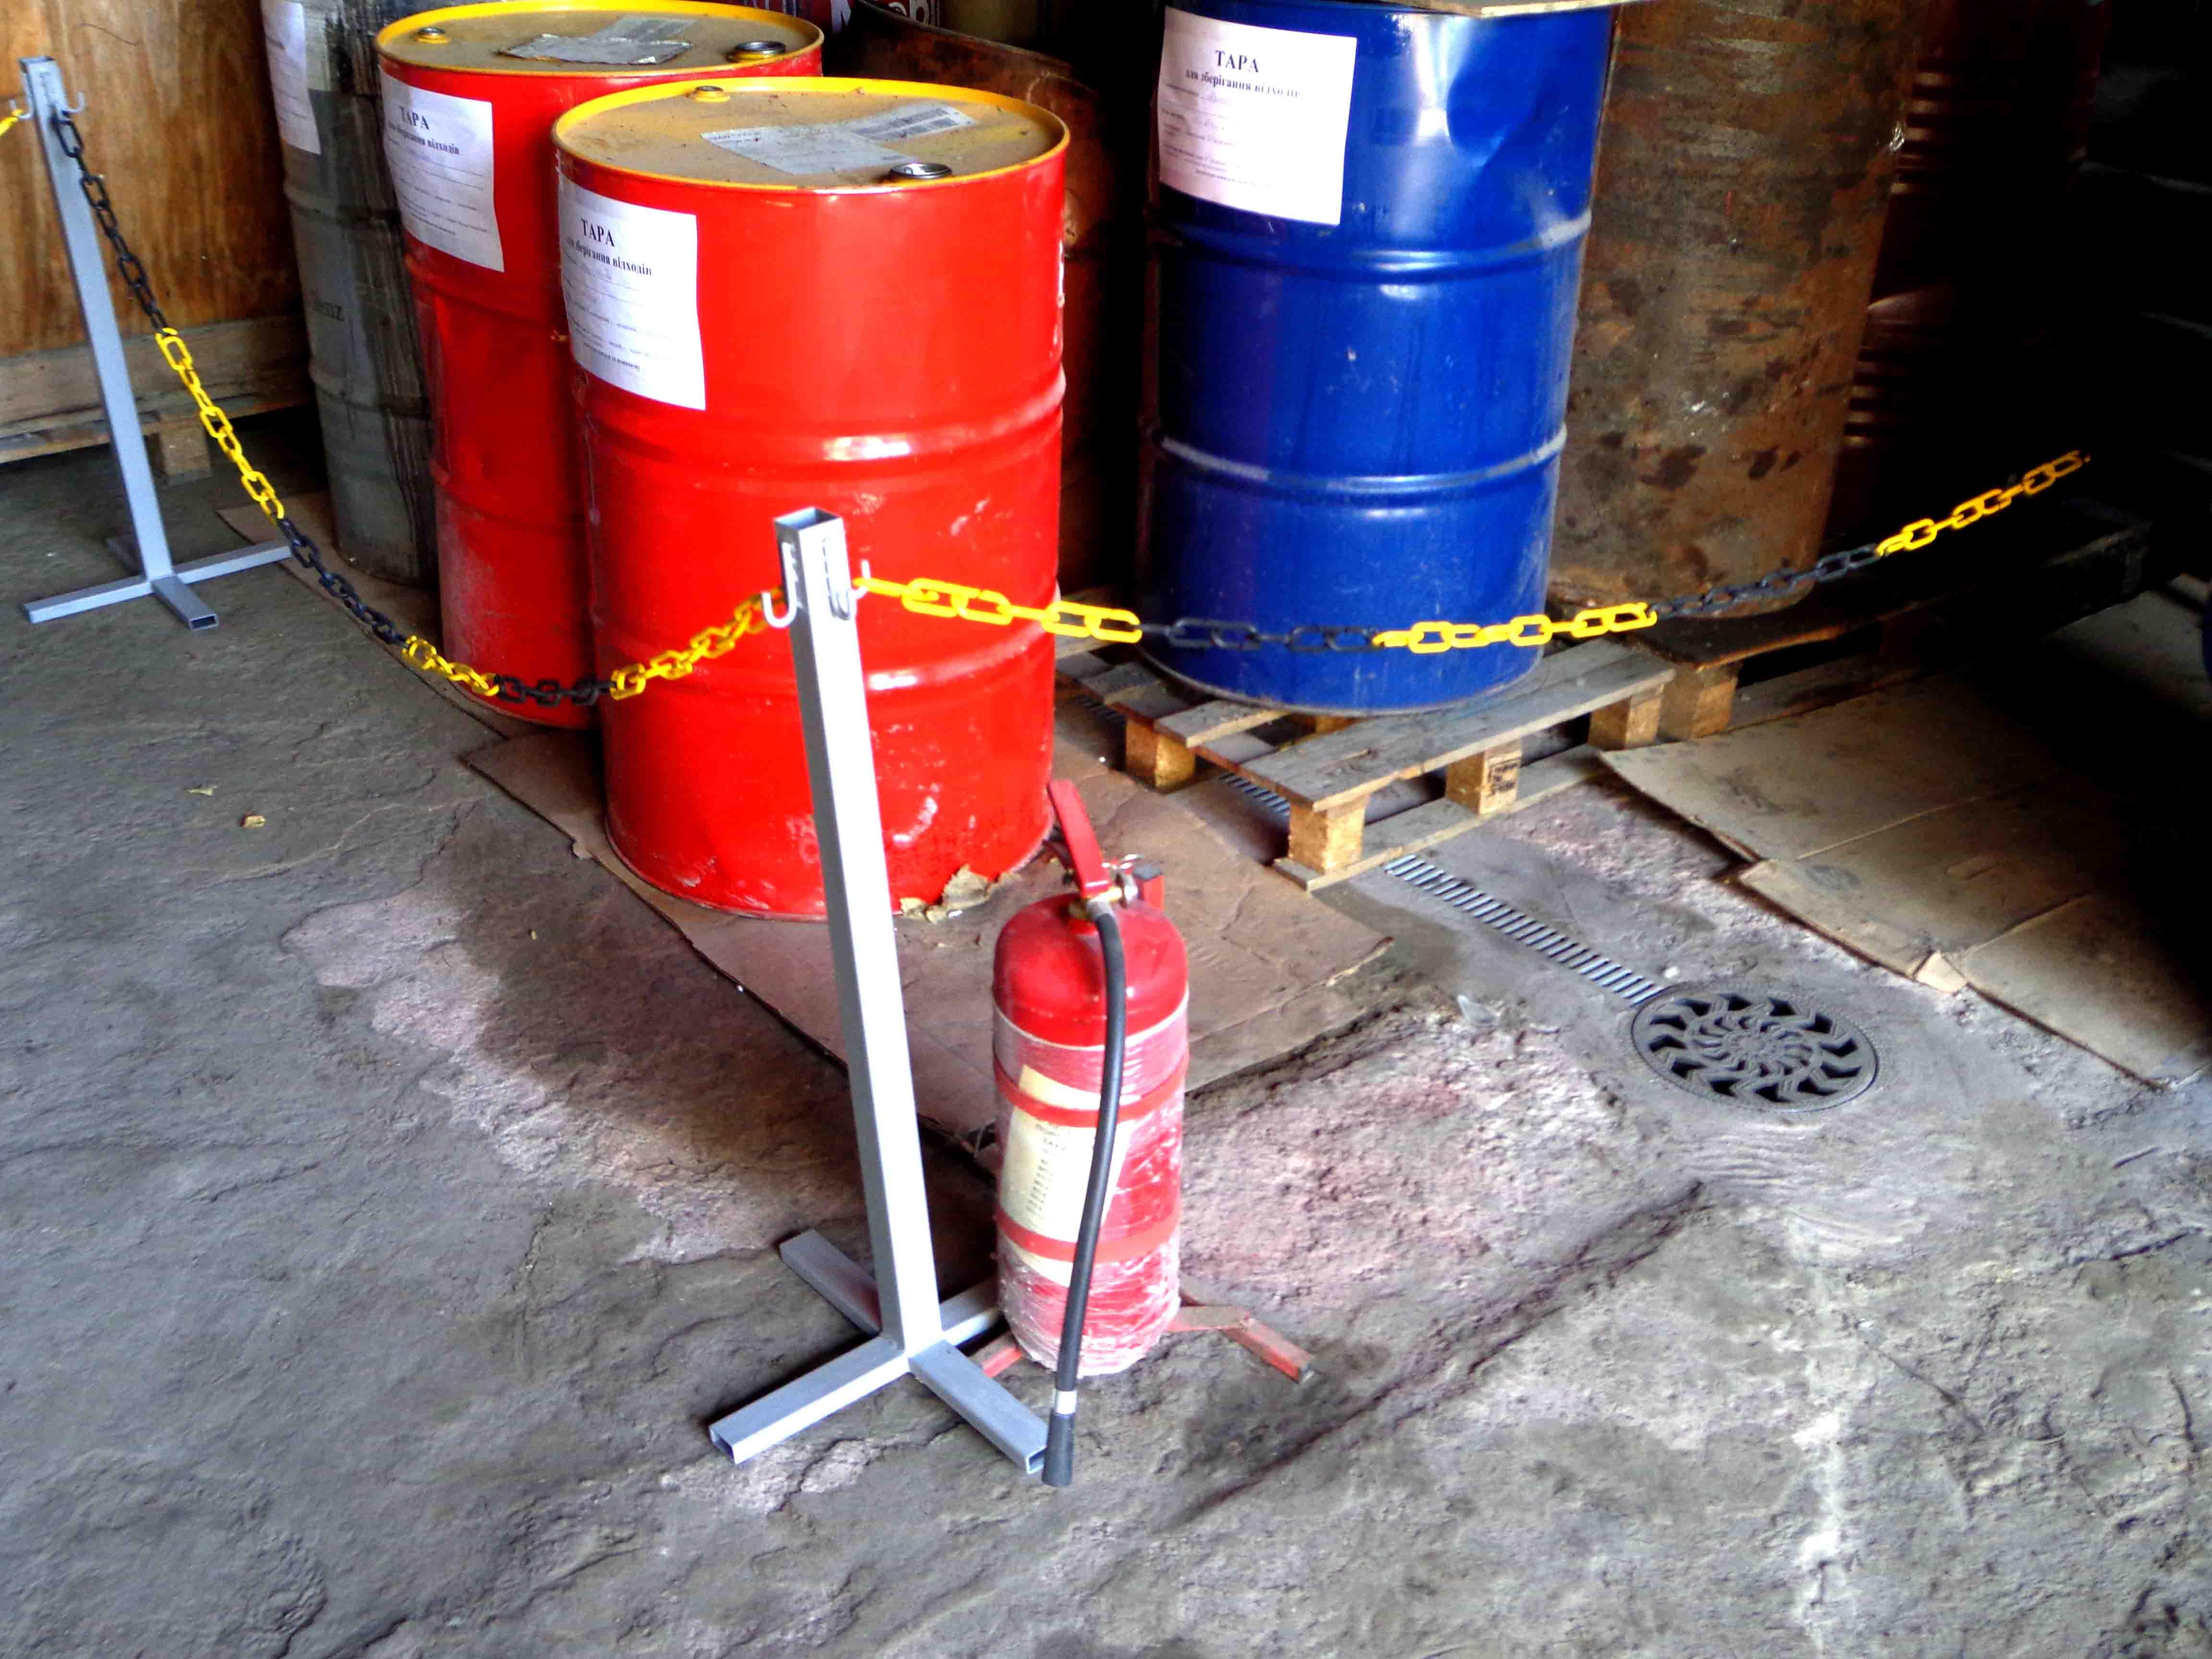 Место хранения жидких отходов разного состава